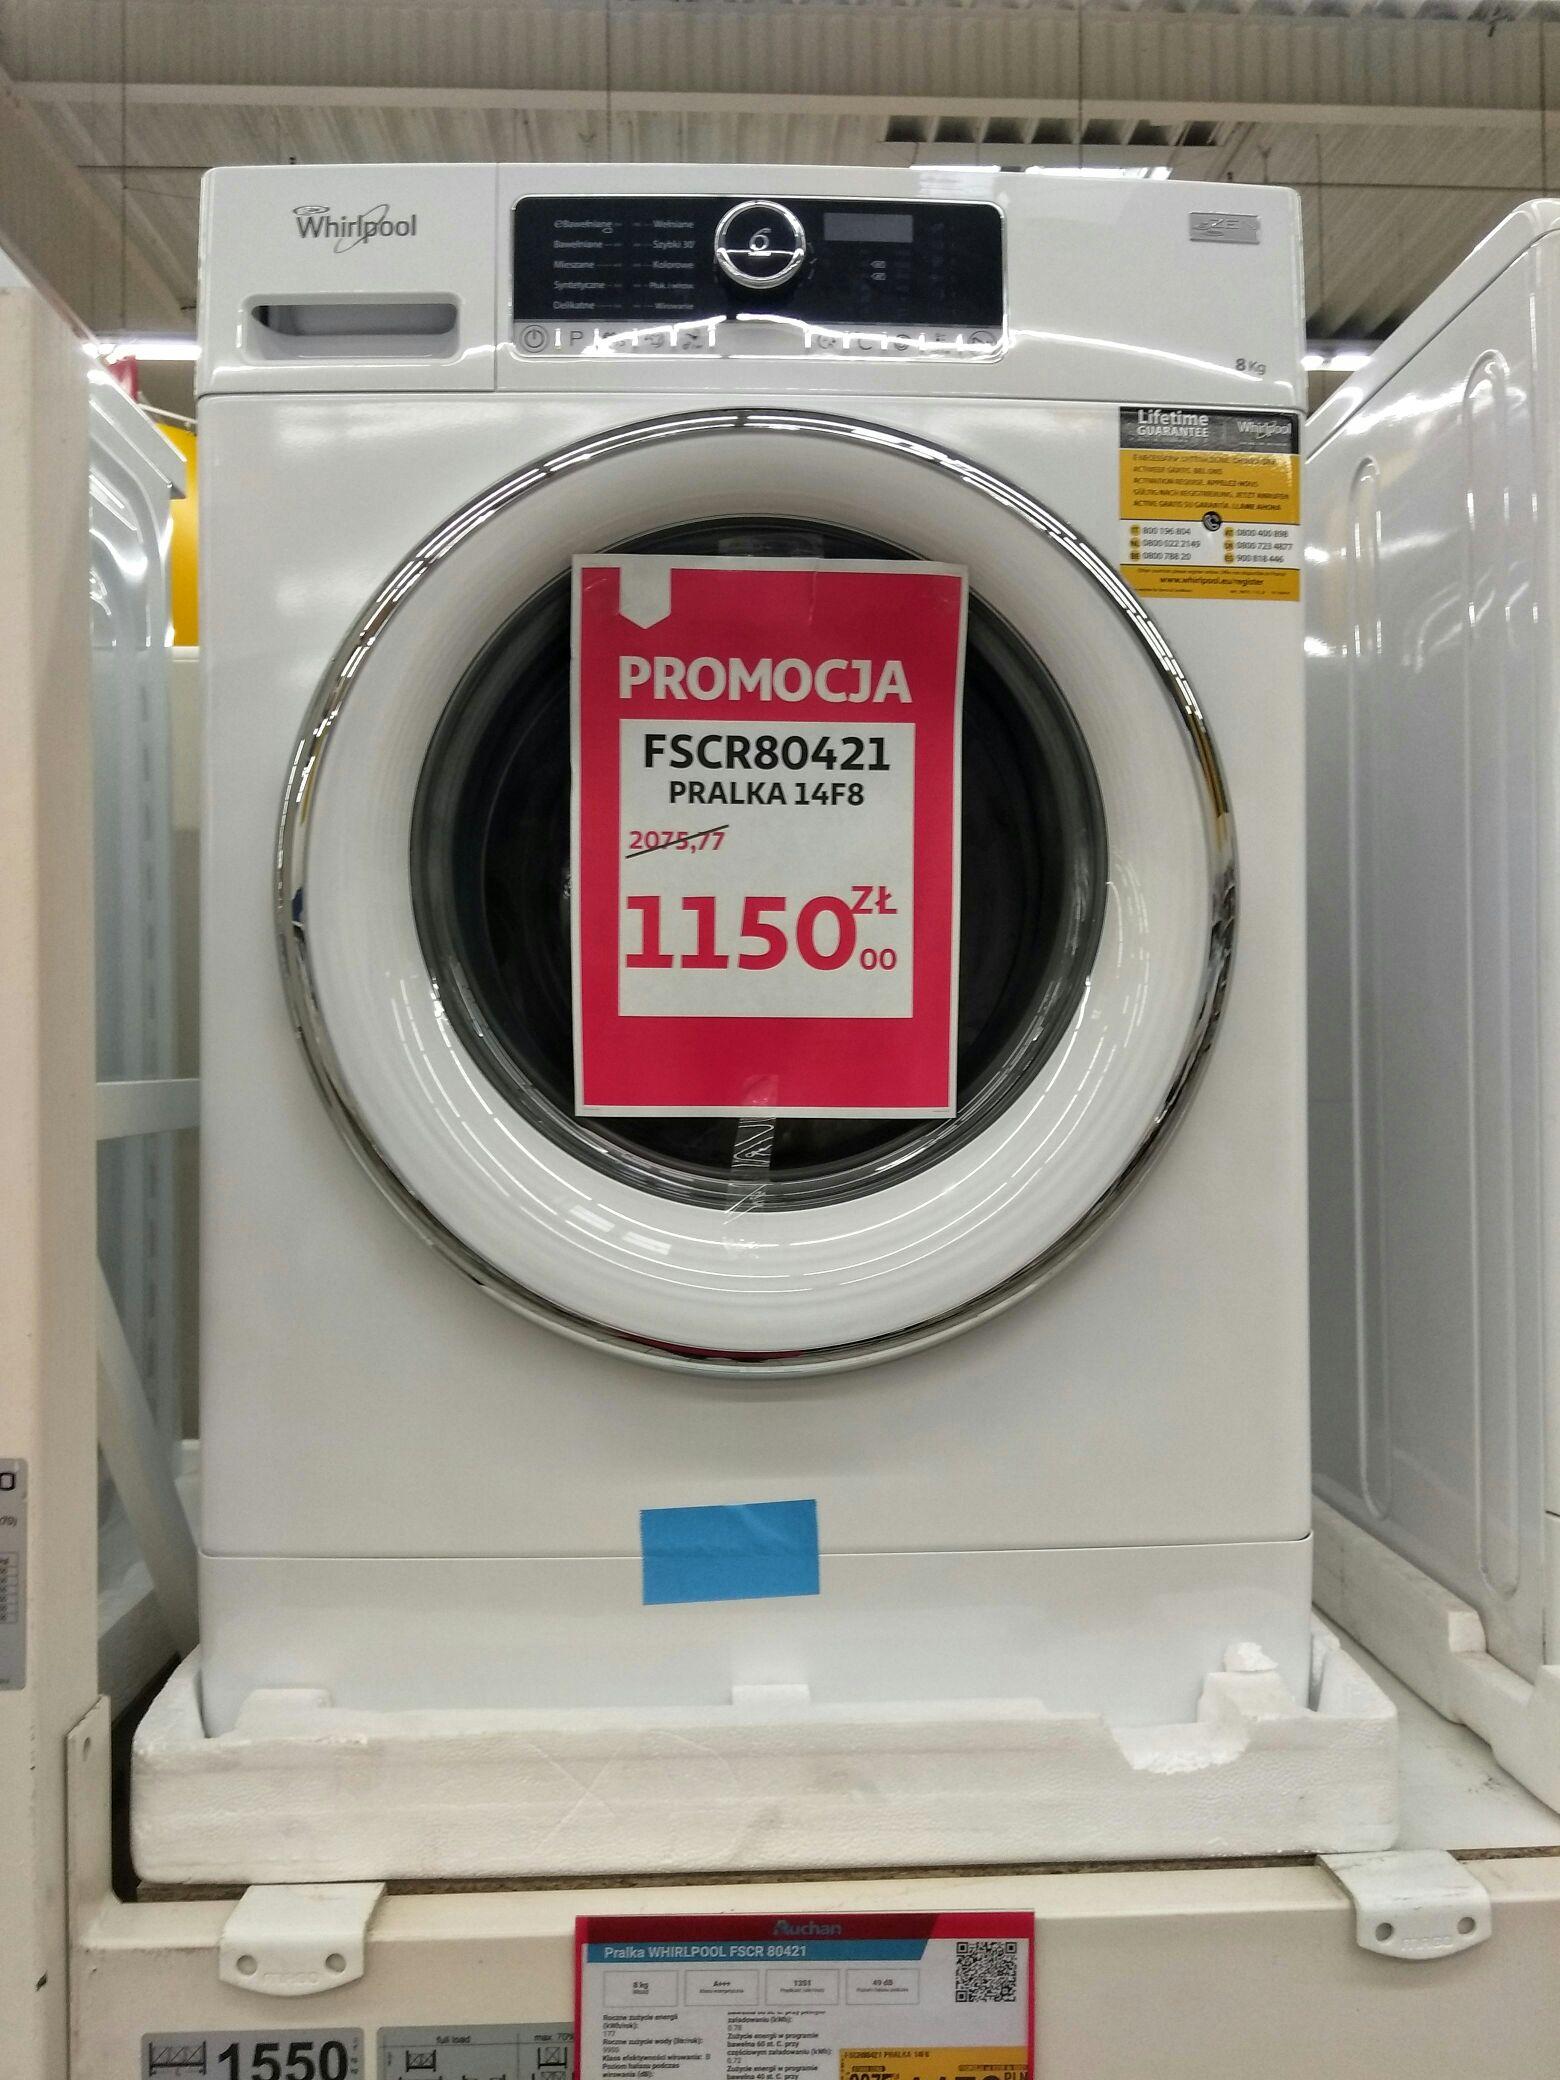 Pralka Whirlpool FSCR80421 @ Auchan (Łódź)